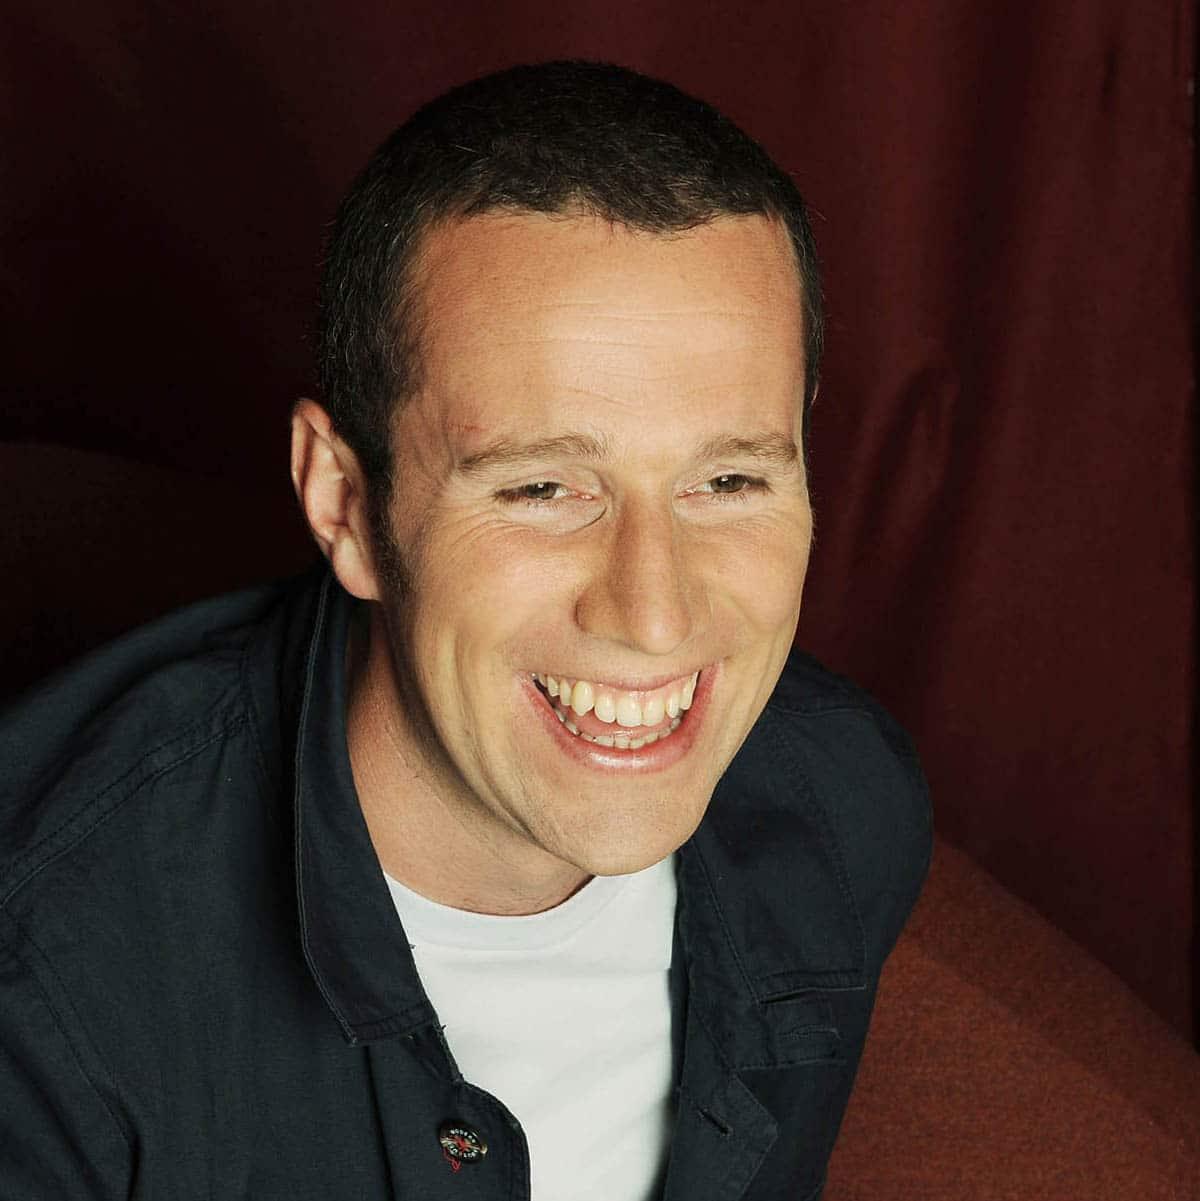 Max-Rushden-TV-presenter-Fantasy-Football-Club-Sky-Sports-speaker-at-Great-British-Speakers